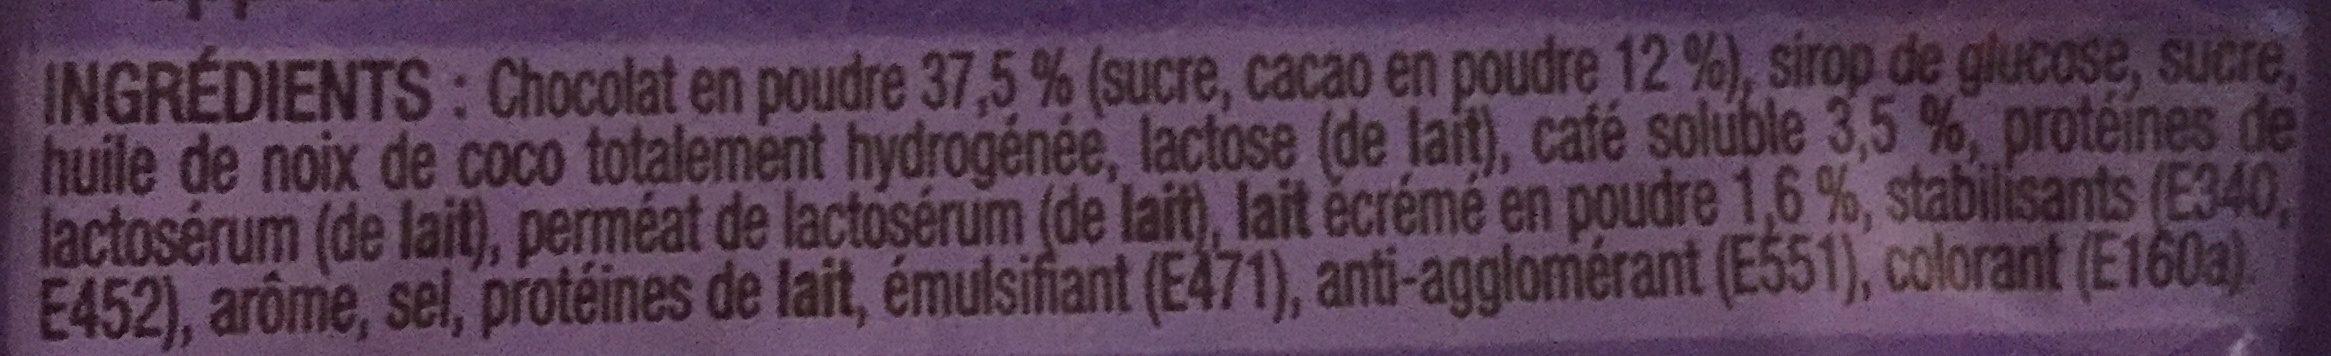 Cappuccino Milka - Ingredients - fr